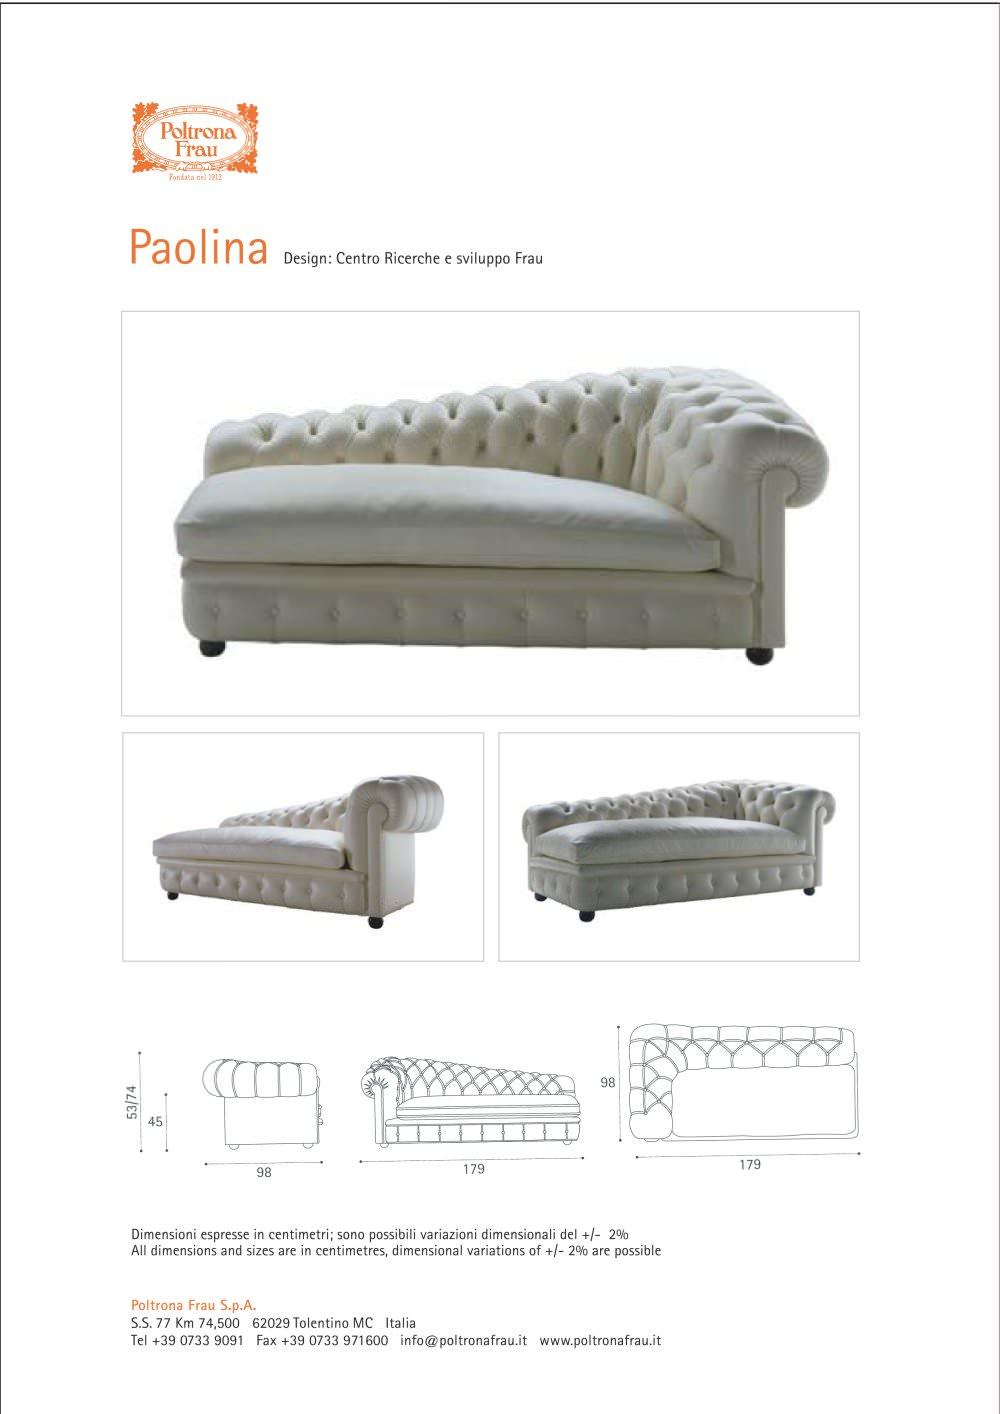 Pa olina - POLTRONA FRAU - Catalogo PDF | Documentazione | Brochure